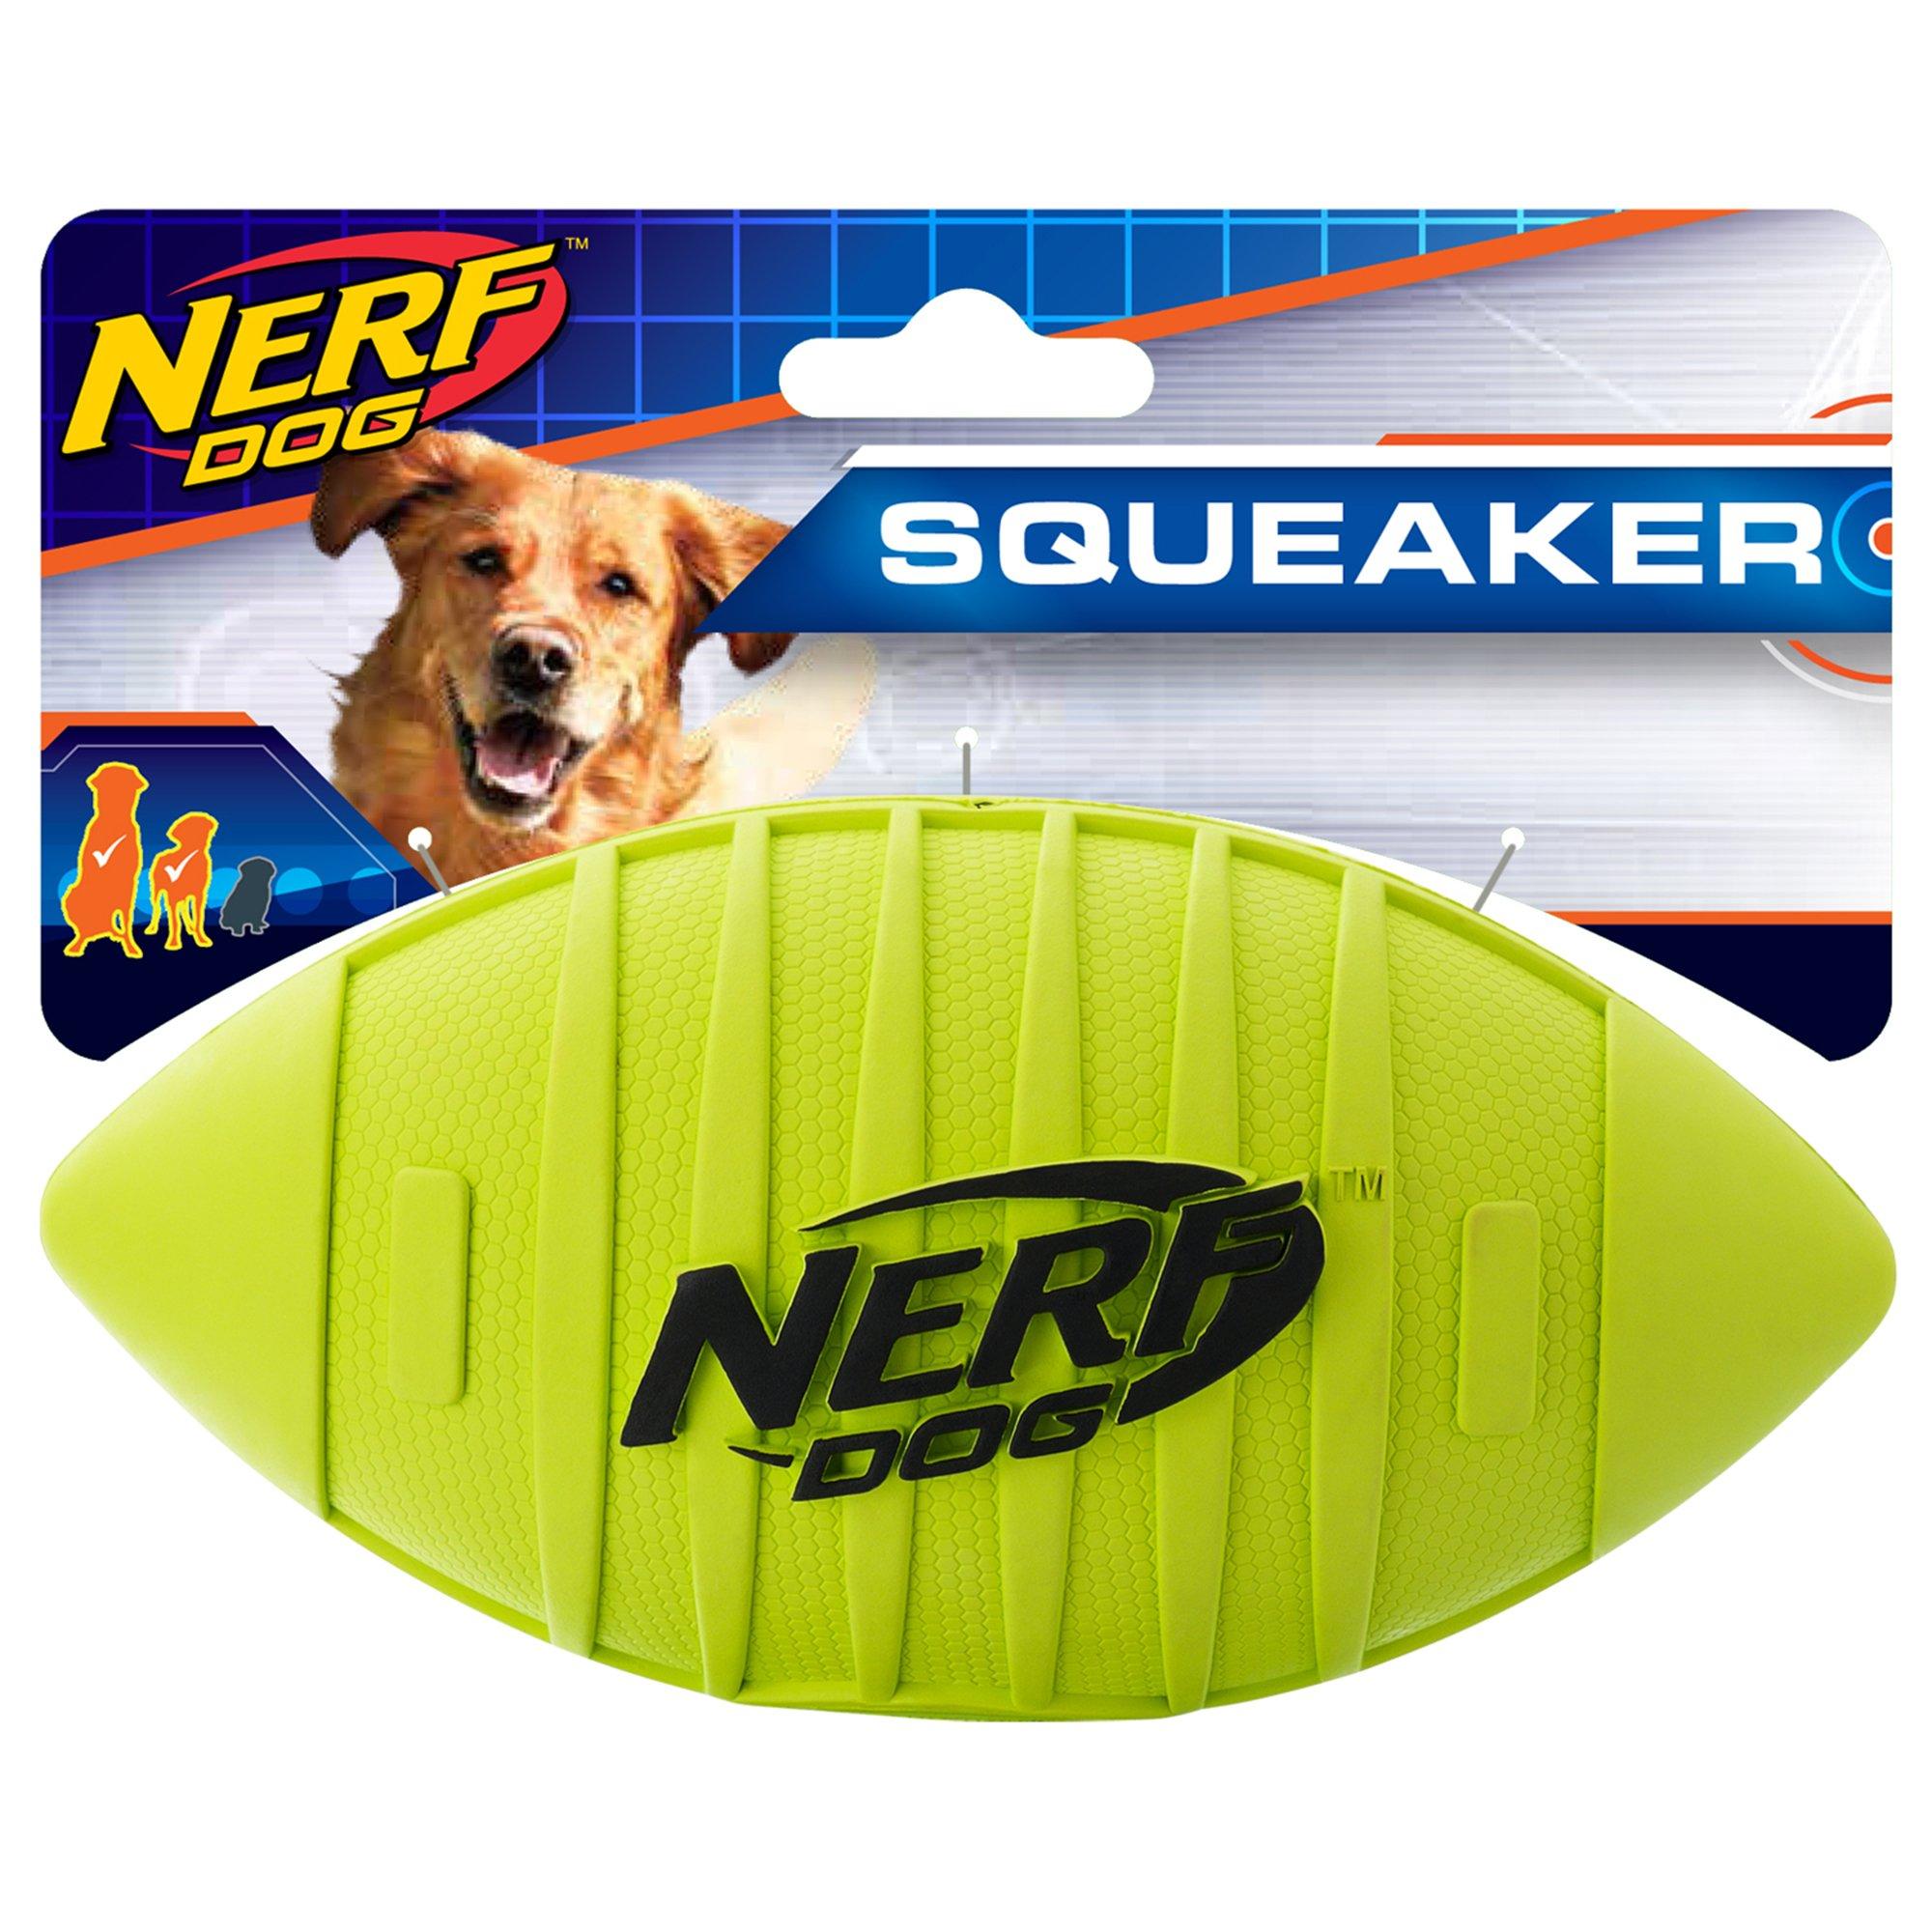 Nerf Dog Squeak Rubber Football Dog Toy, Medium/Large, Green